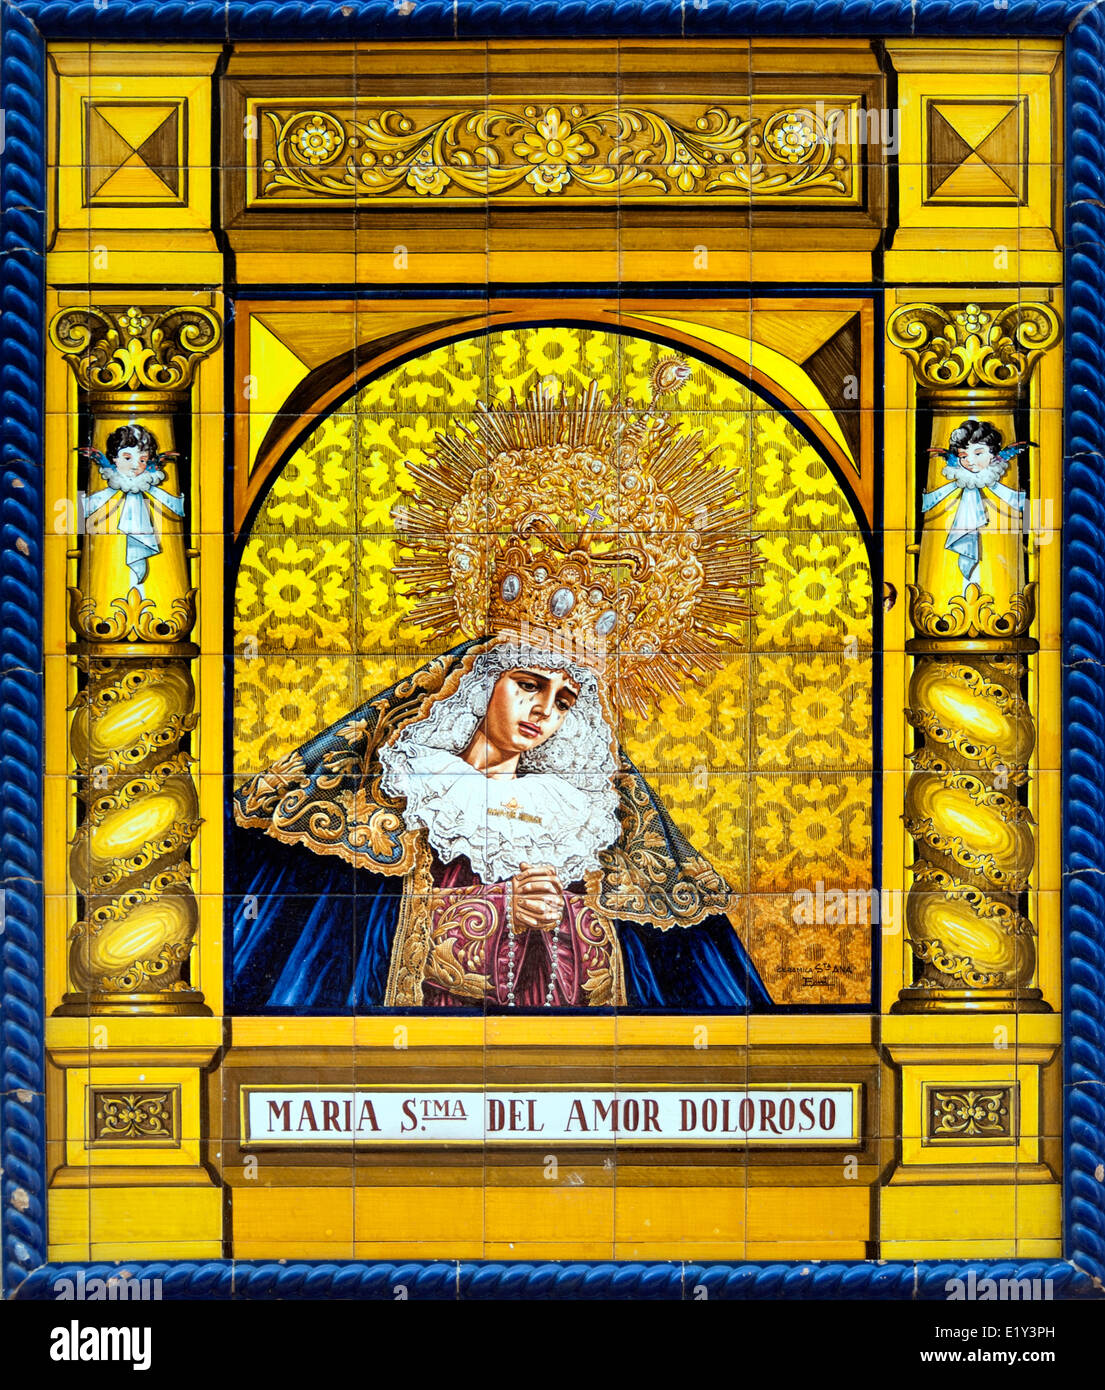 María Stma Del Amor Doloroso - schmerzhafte Liebe Mary Malaga Spanien katholische Kirche Christian Ceramic gesegnet Stockfoto